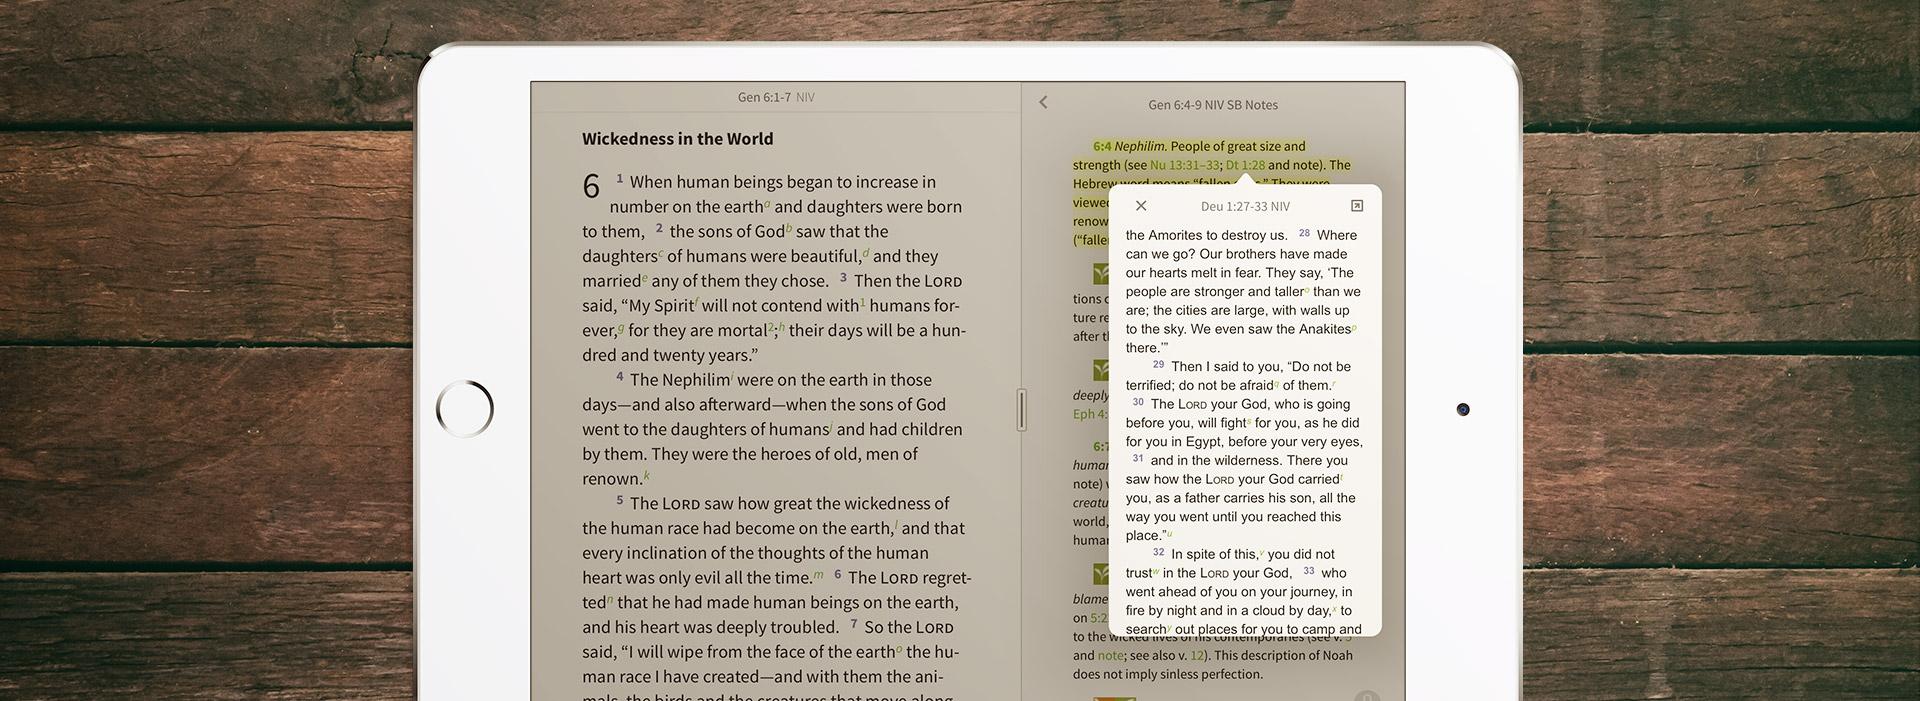 Pop up window in the Olive Tree Bible App